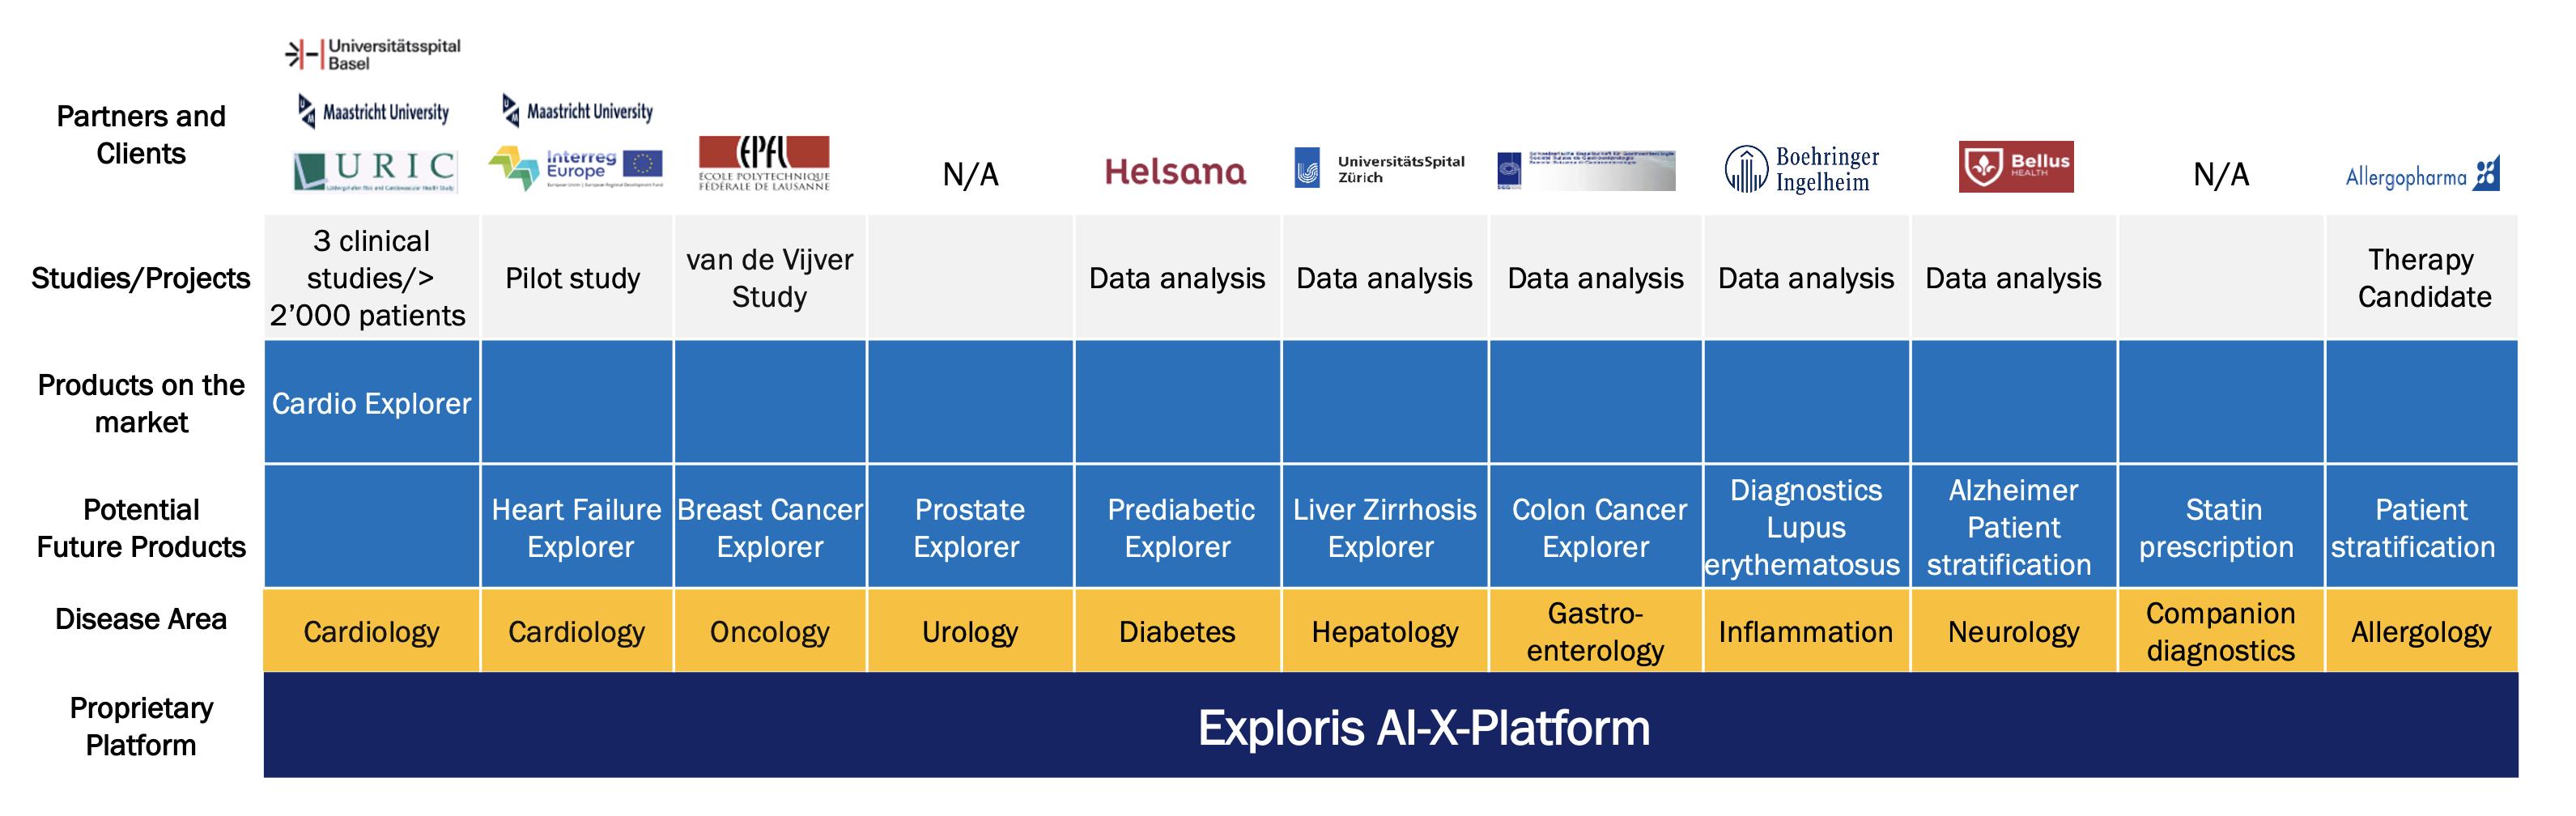 Potential Applications for Exploris AI-X-Platform in Cardiology, Oncology, Urology, Diabetes, Hepatology, Gastroenterology, Inflammation, Neurology, Companion diagnostics, Allergology